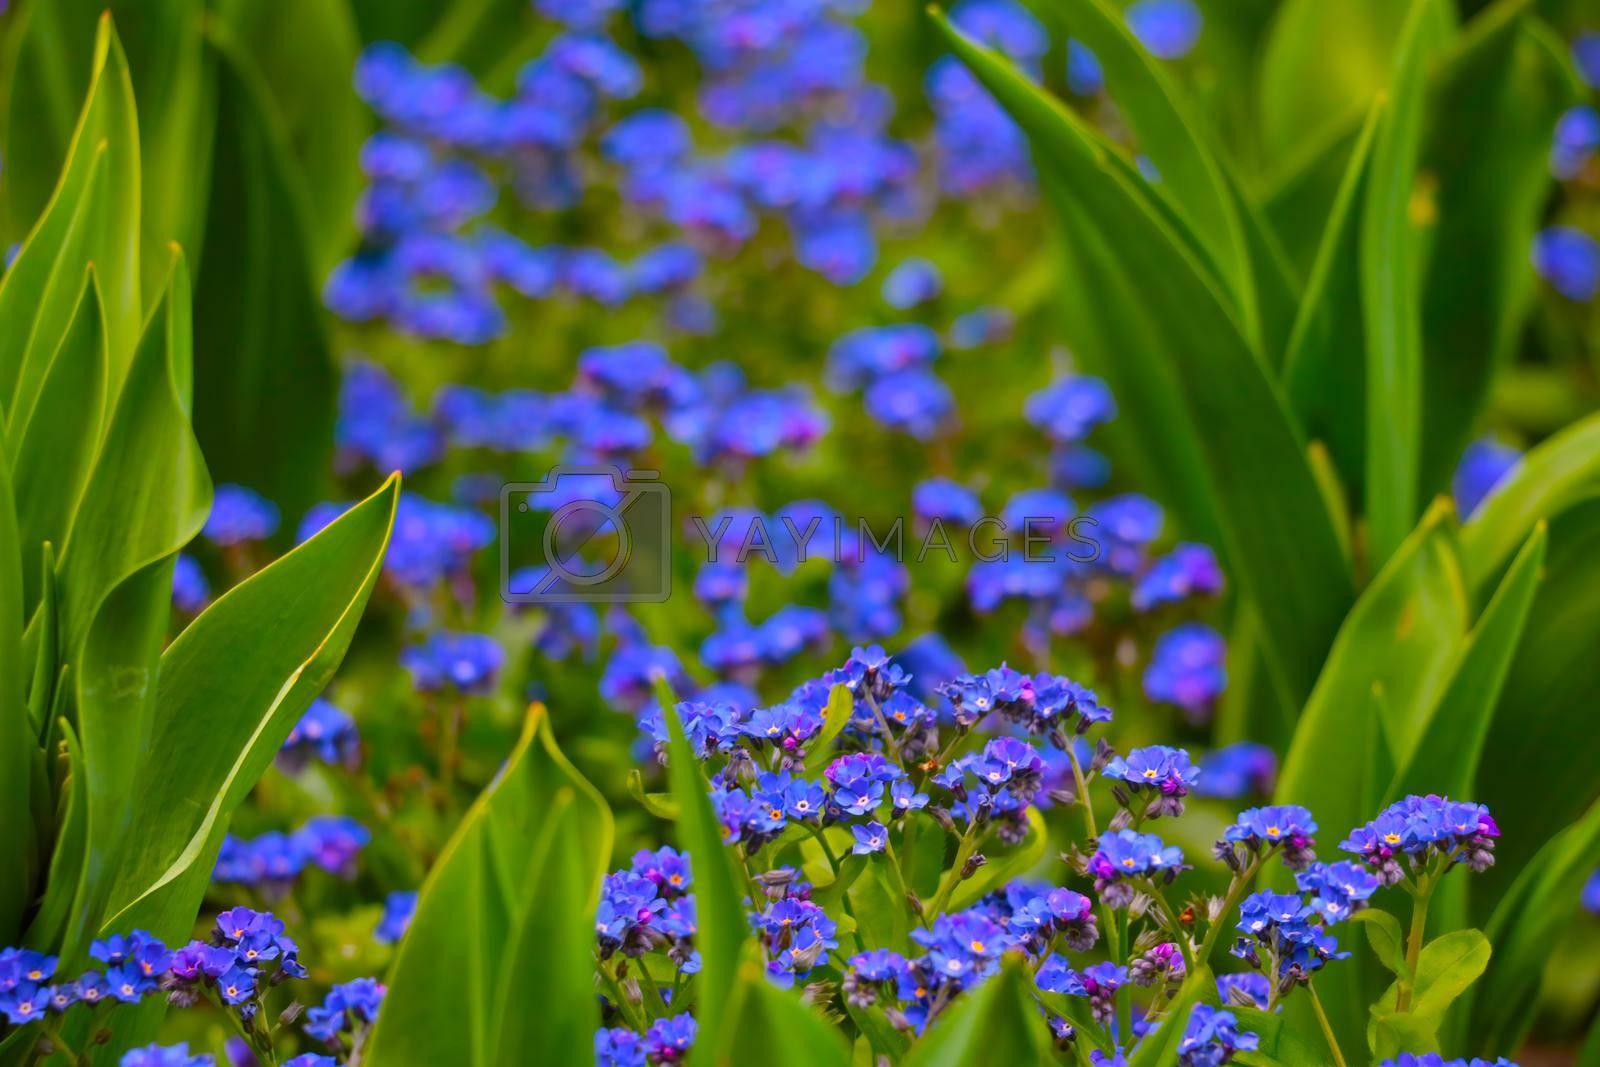 Royalty free image of Beautiful blooming perennial blue flowers in the meadow. by kip02kas